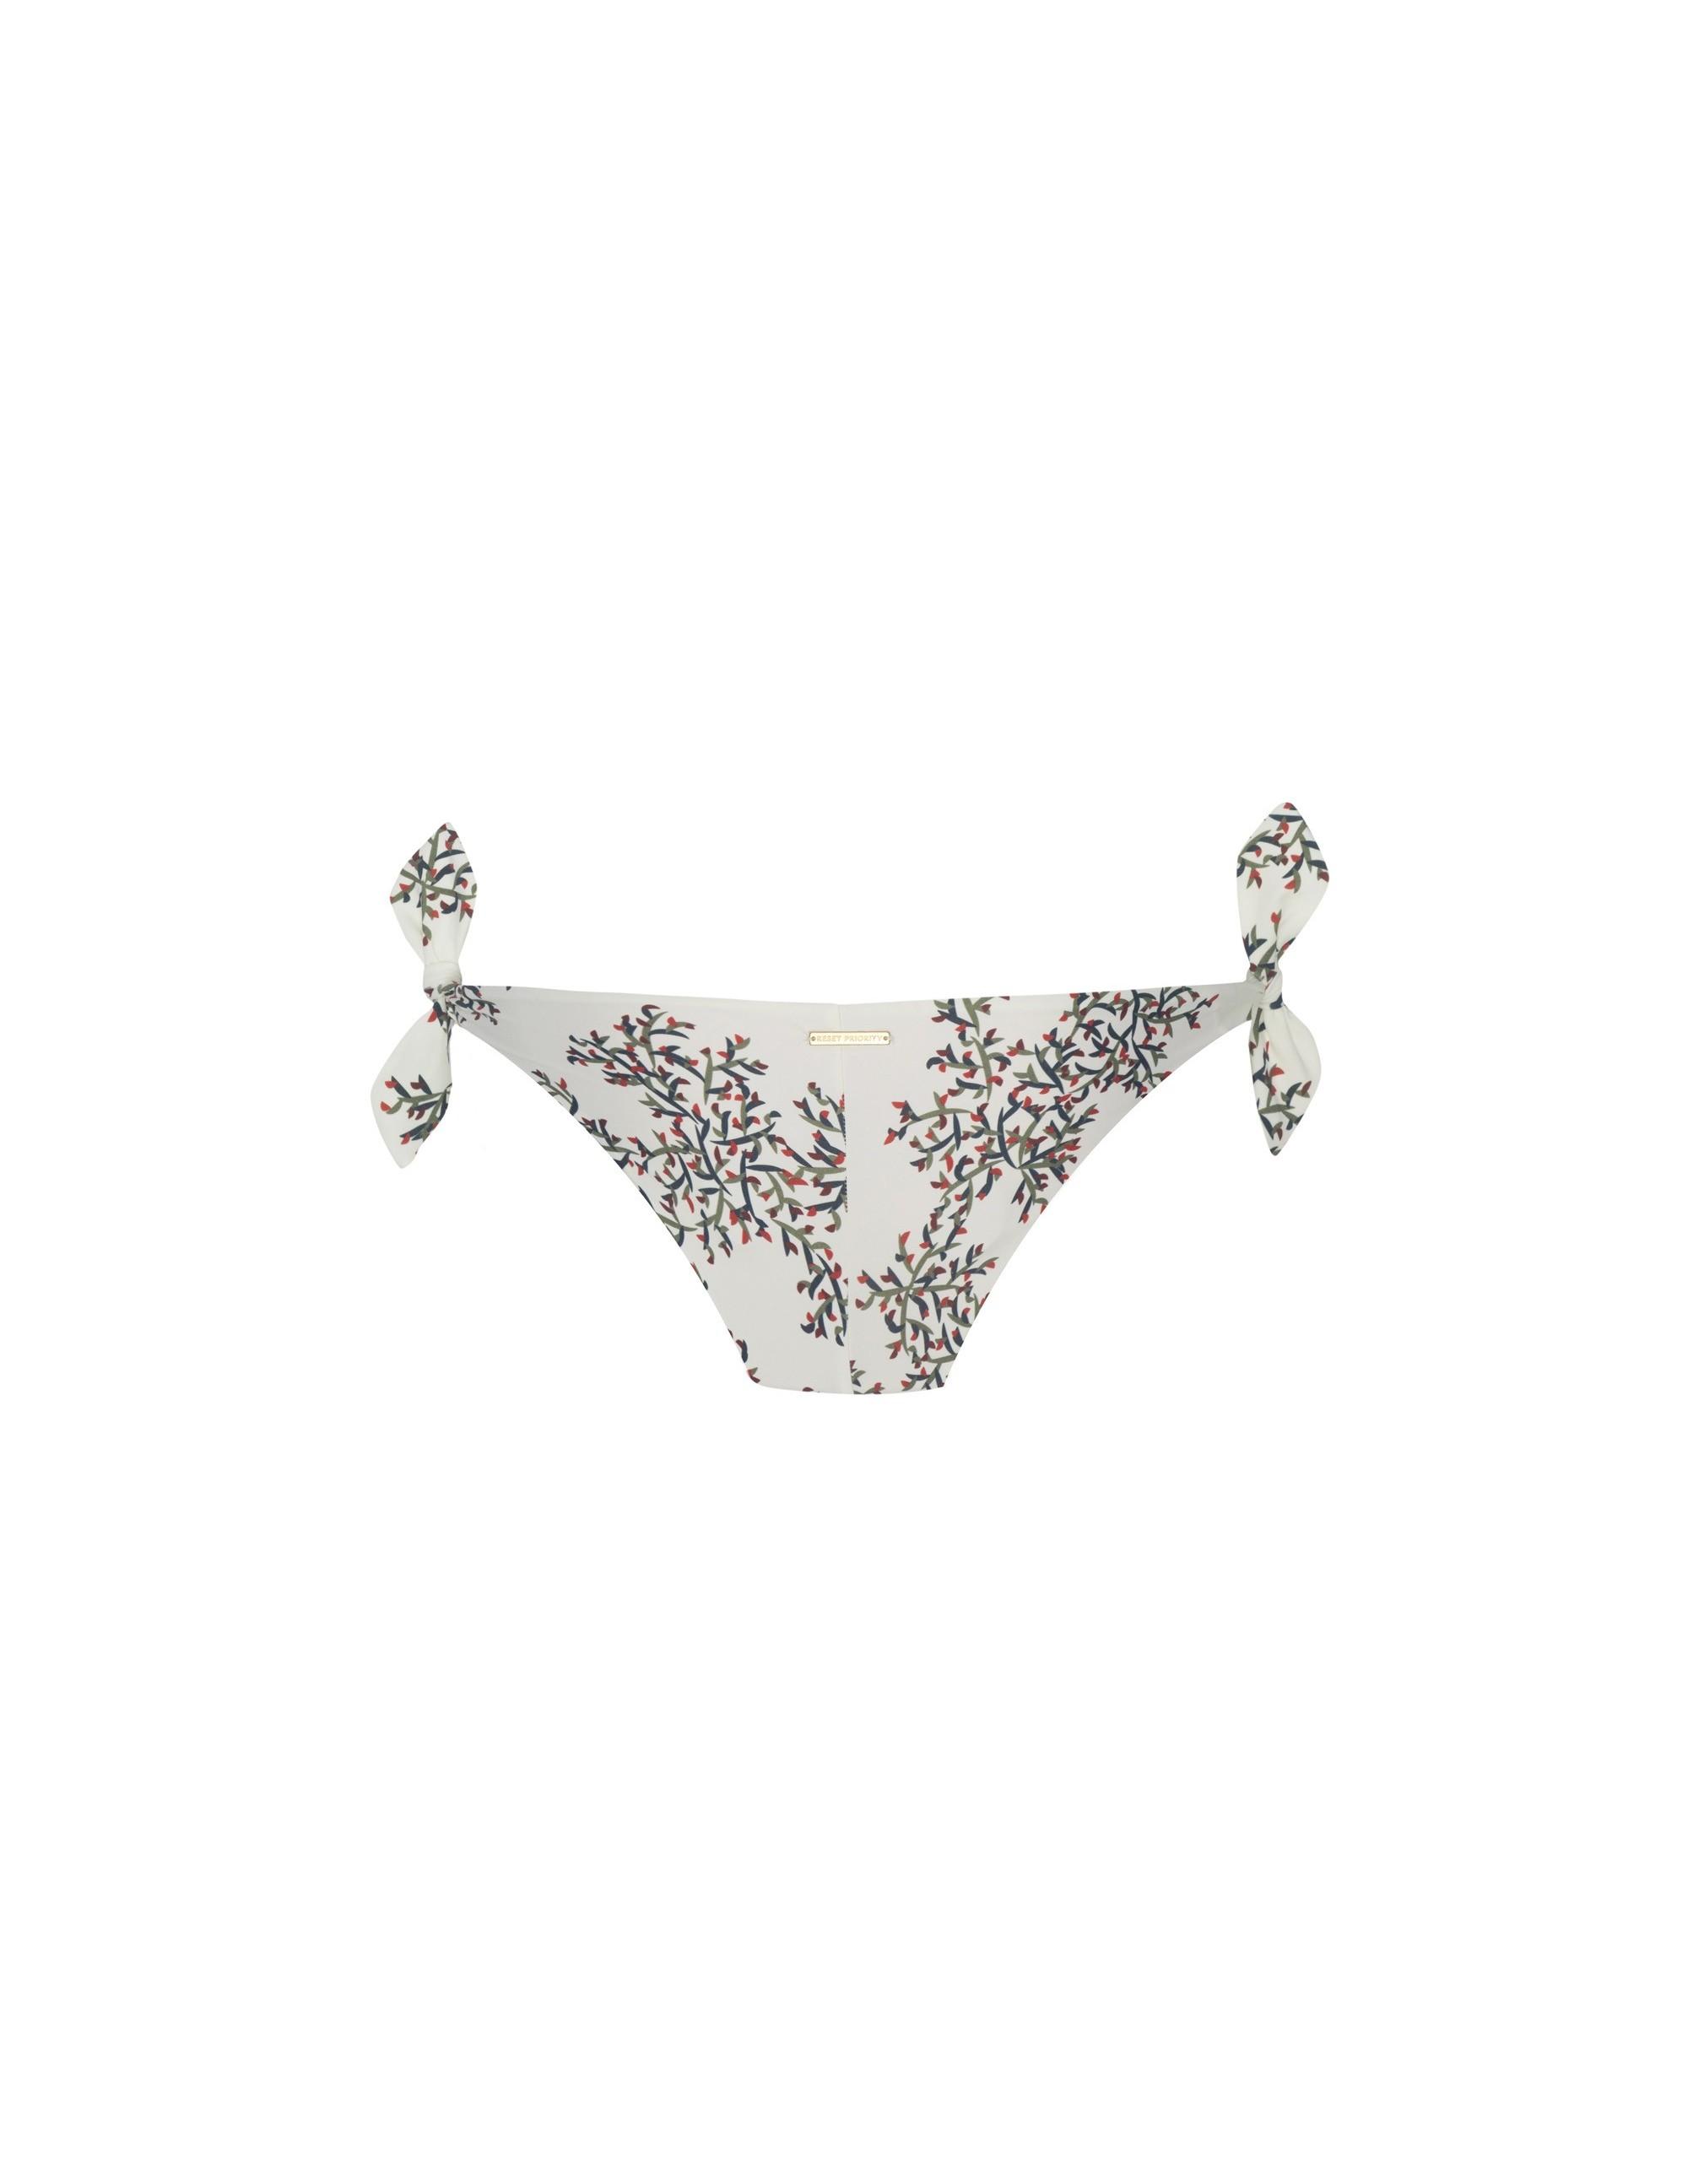 MISALI bikini bottom - ACACIA